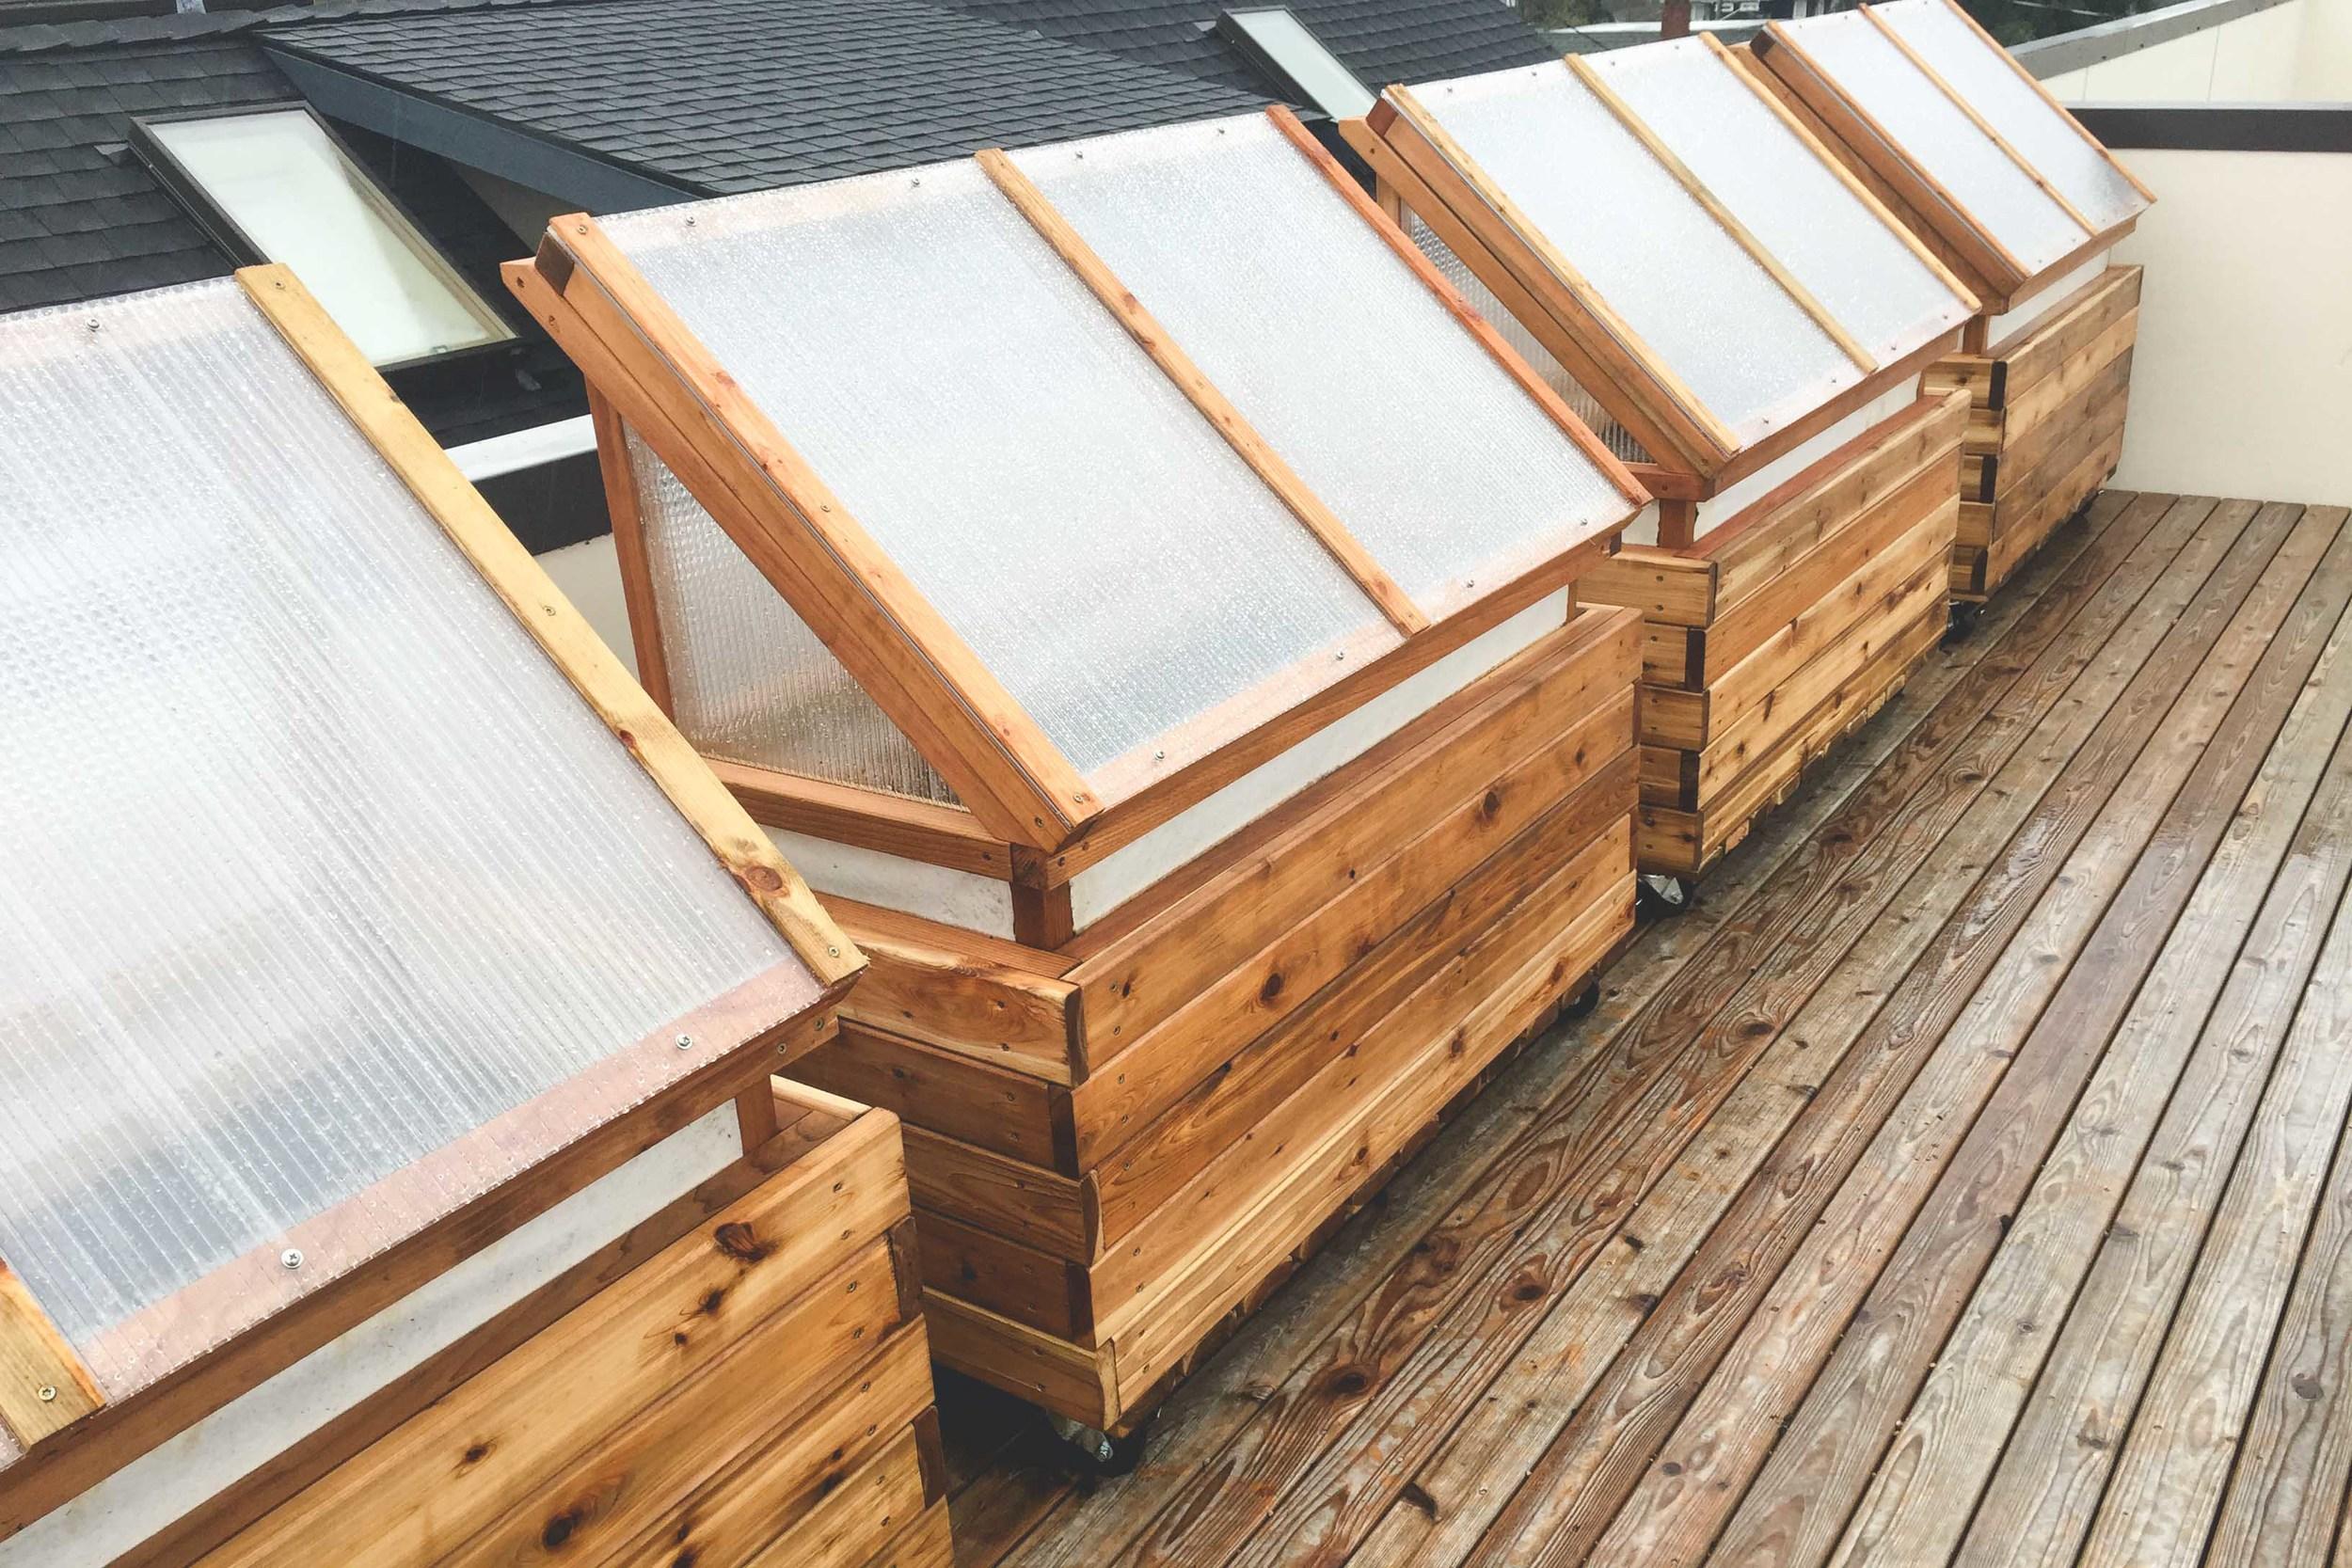 4 Season Rooftop_Vegetable Garden_Seattle Urban Farm Co_custom design and build.jpg